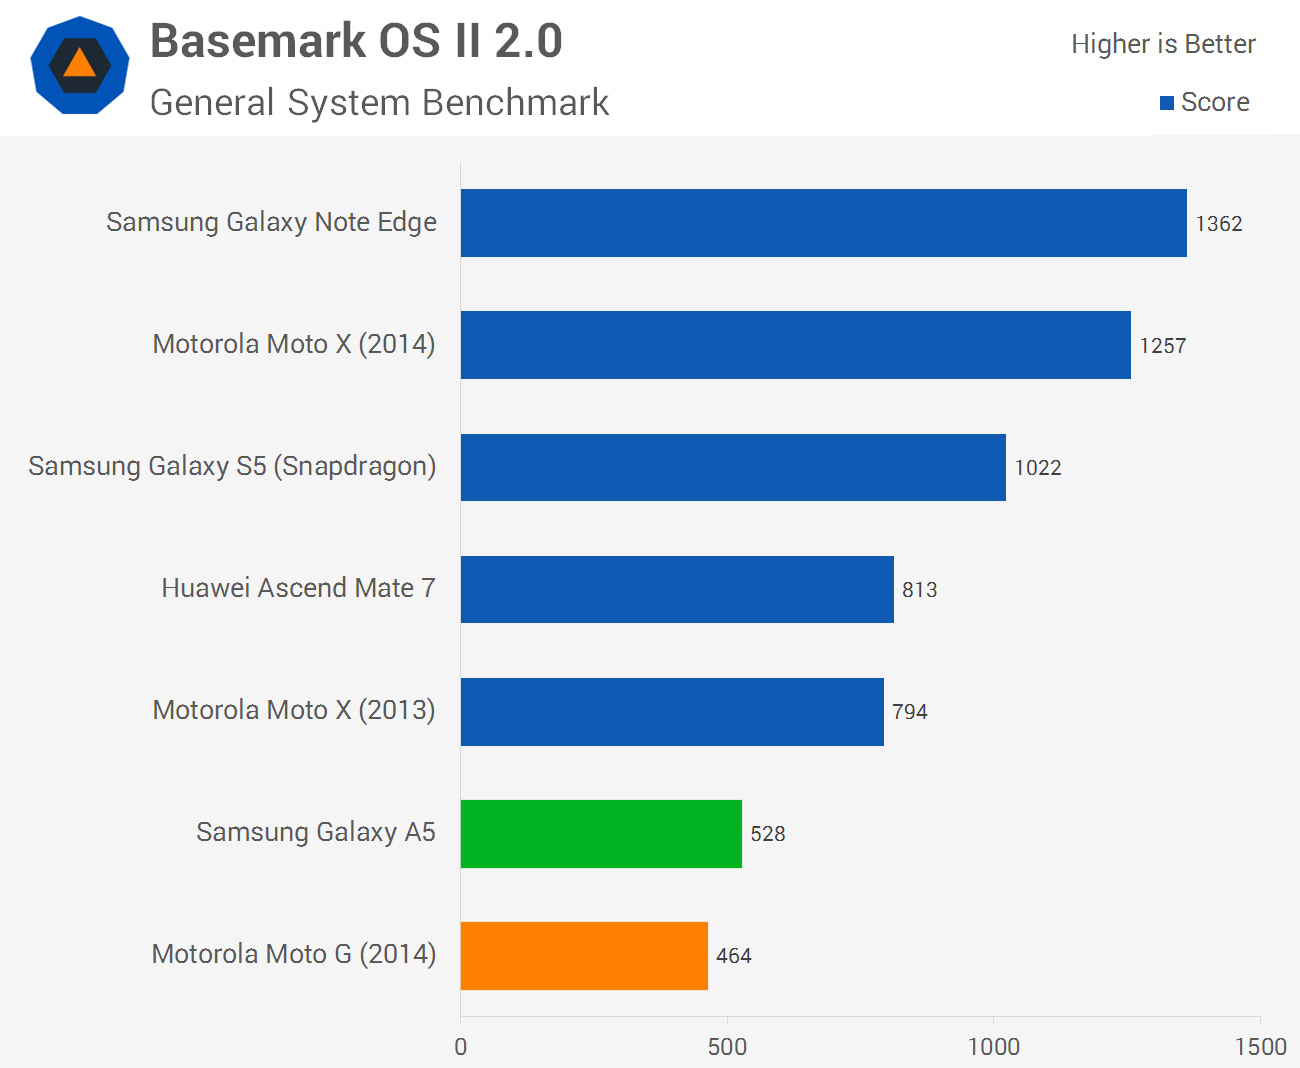 Xiaomi Redmi 2 - [Review] - Snapdragon 410 - 64 Bit - 4G LTE ...